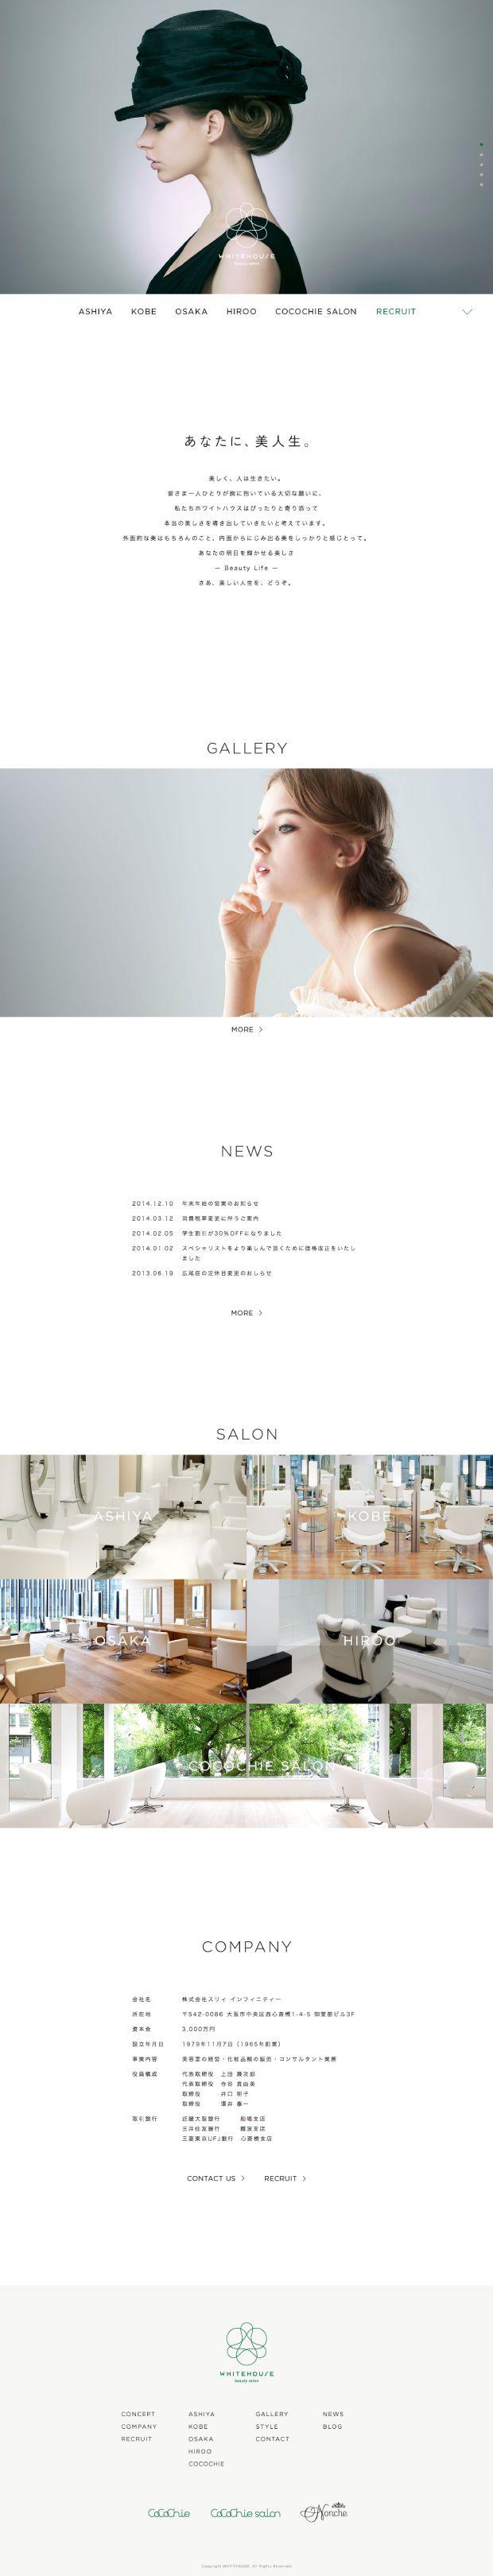 http://www.starryworks.co.jp/works/2014/09/17/whitehouse-beauty-salon.html